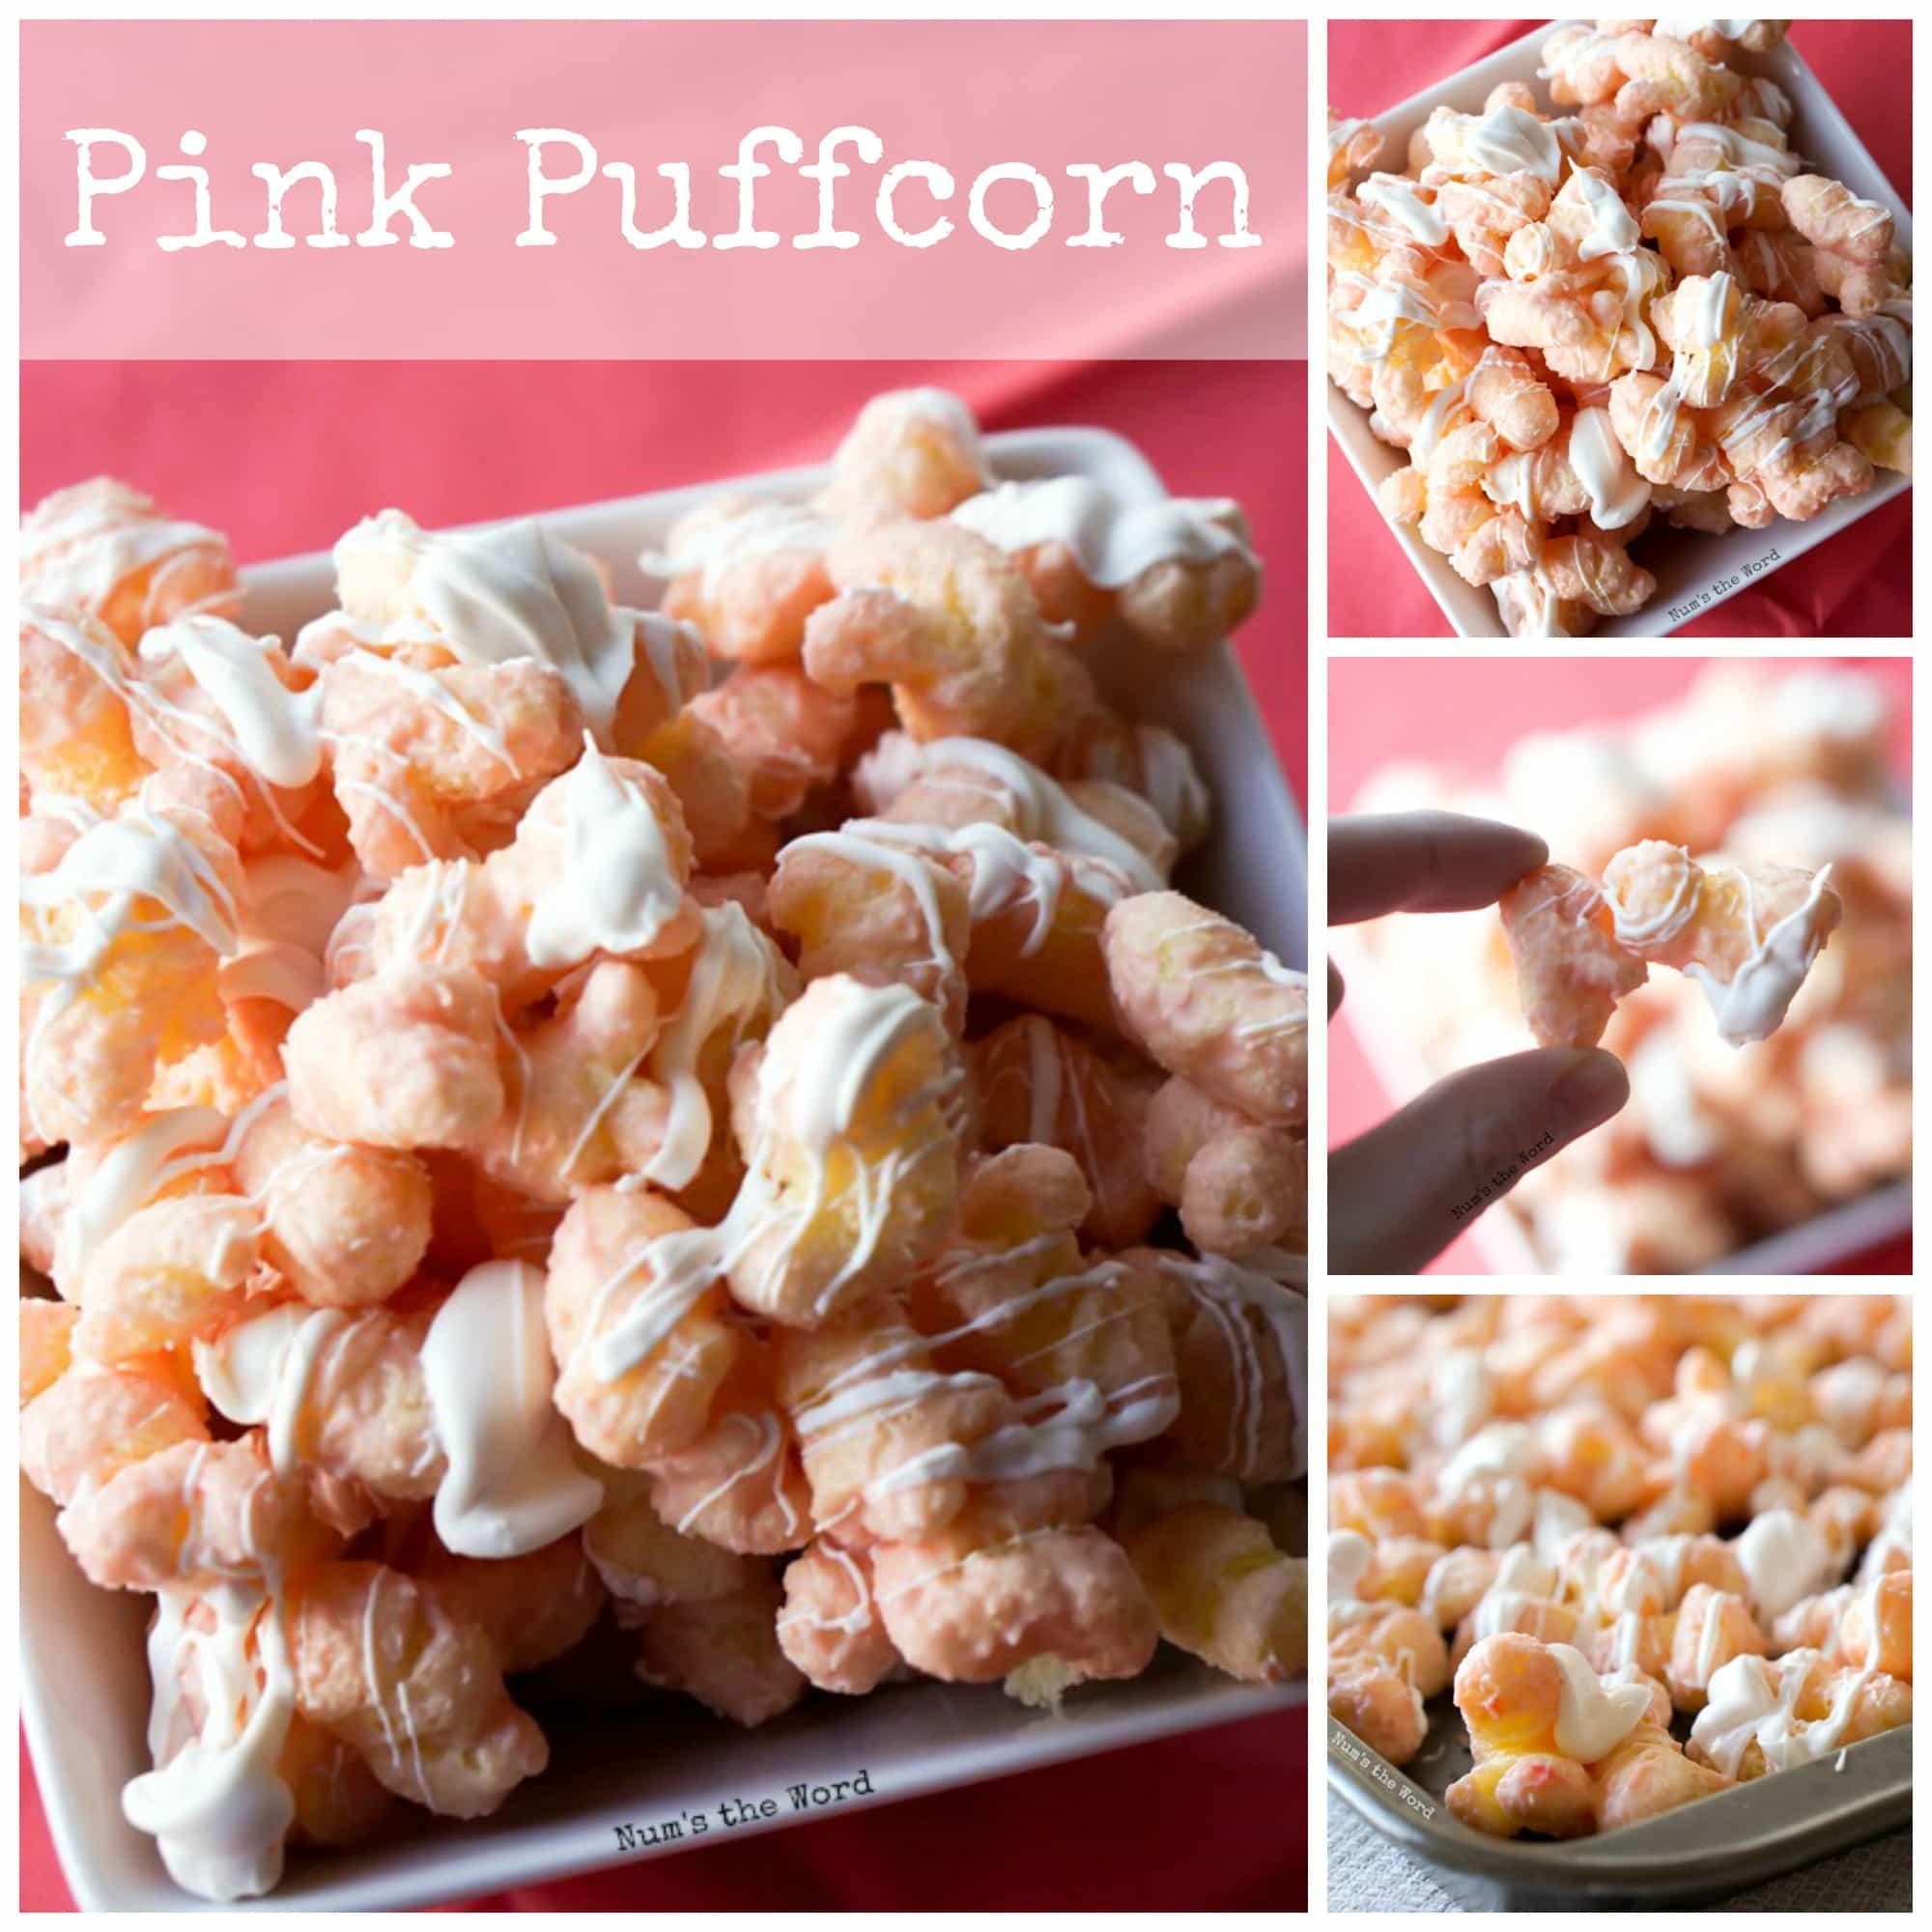 Pink Puffcorn